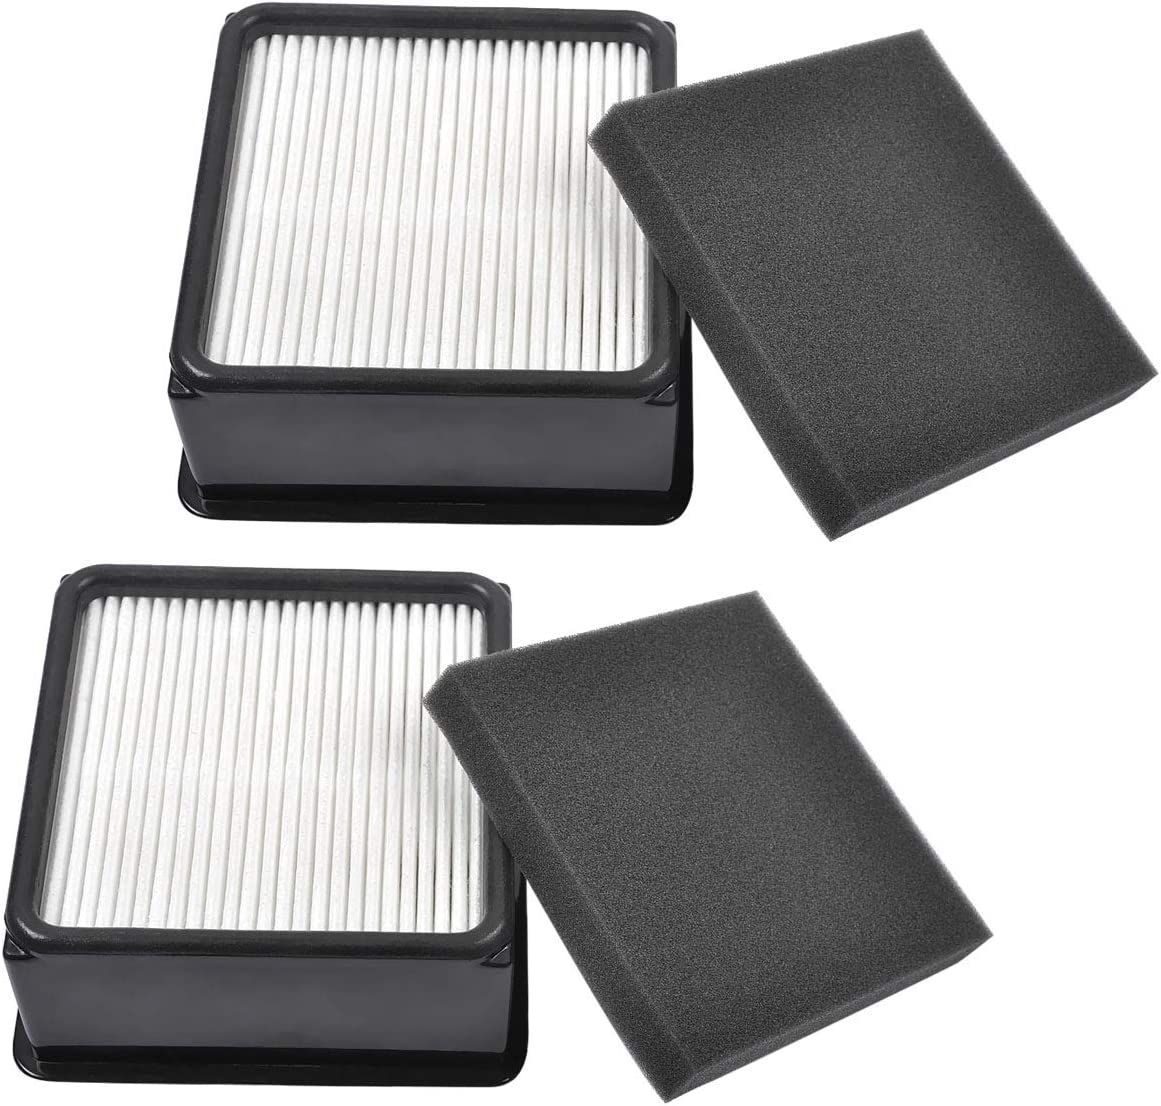 KEEPOW 2 Set F66 HEPA and Foam Filter for Dirt Devil UD70105 Uprights Vacuum, Part# 304708001